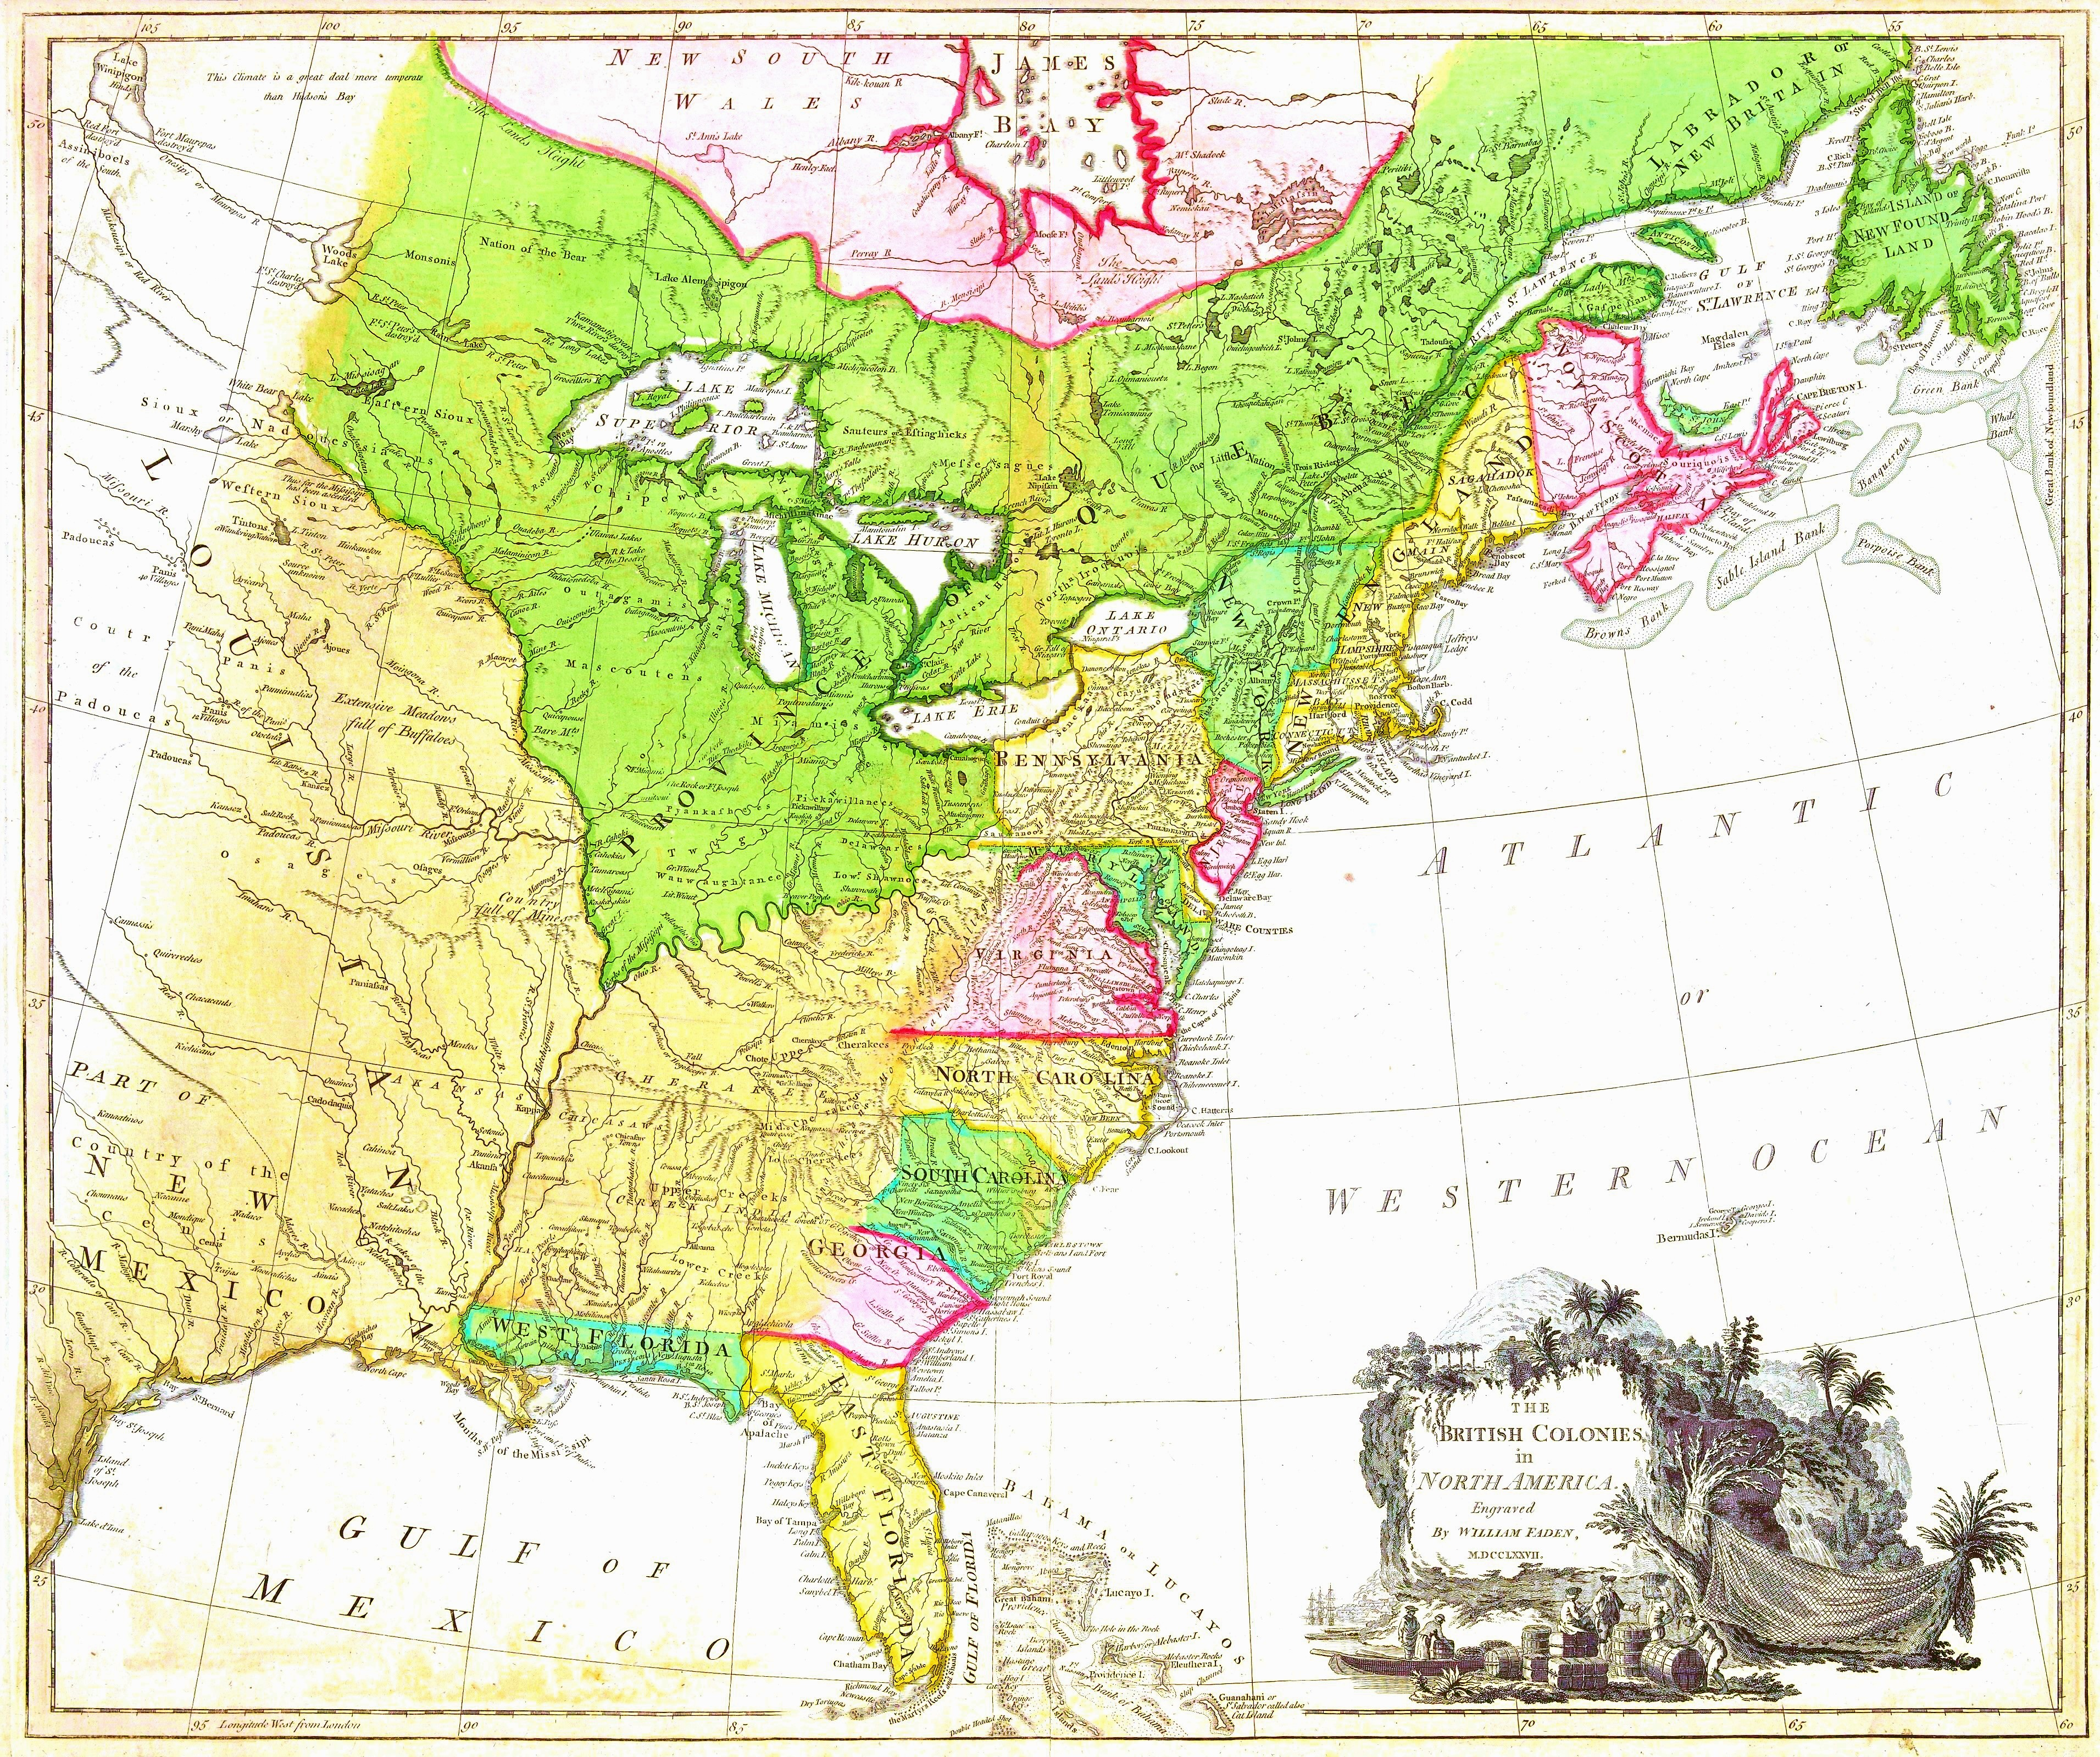 FileThe British colonies in North Americajpg  Wikimedia Commons